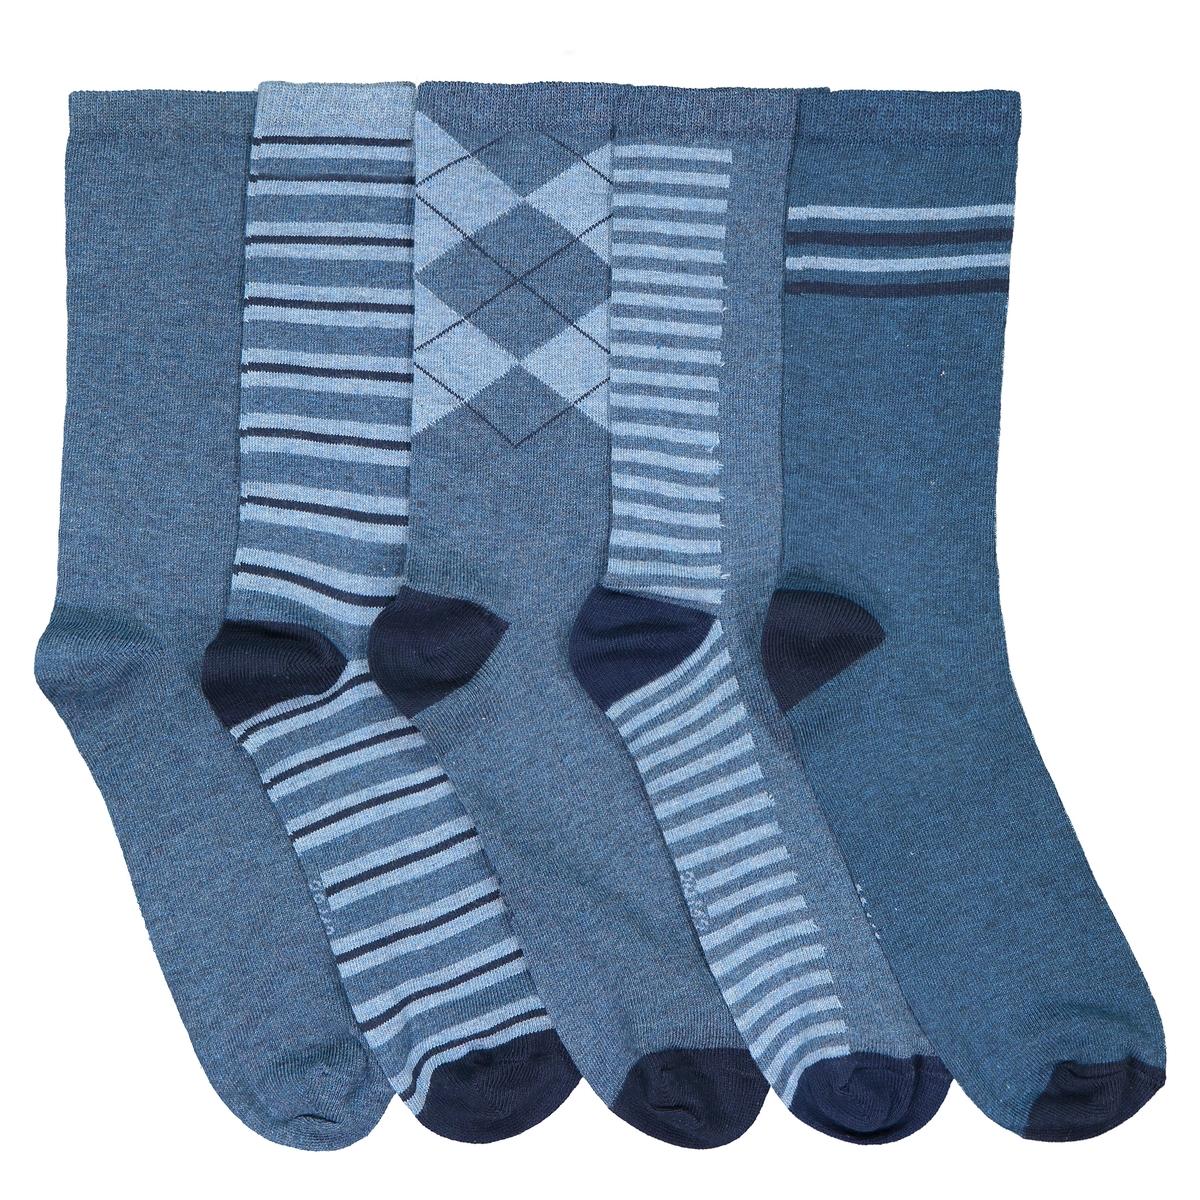 5 пар La Redoute Носков 1922-3942 31/34 синий ostin сет из 5 пар носков